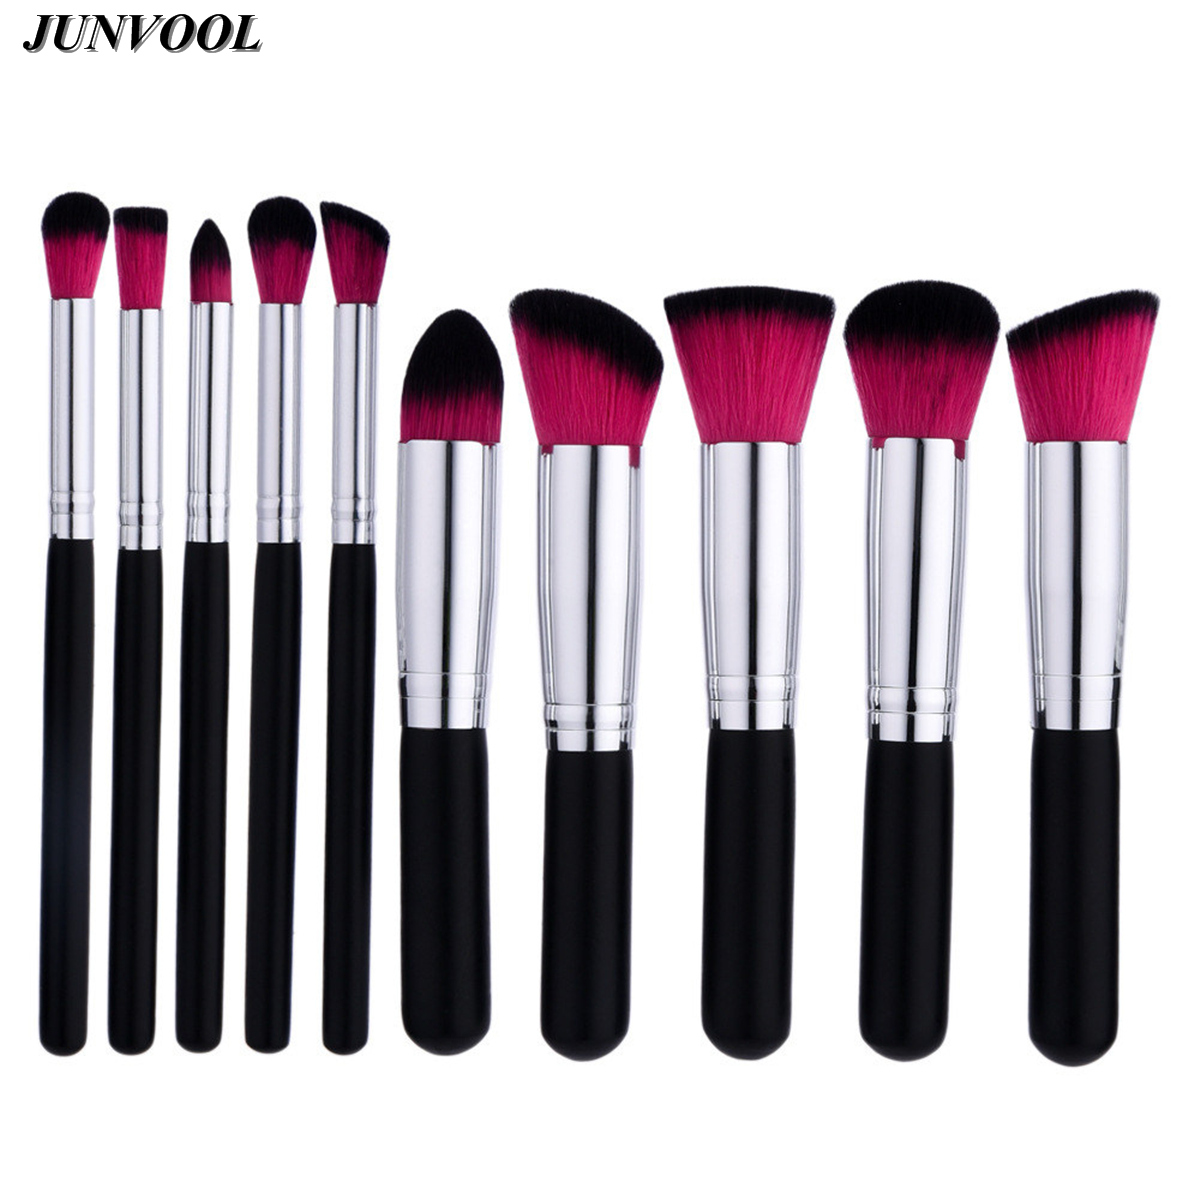 Professional 10 Pcs Makeup Brush Black Pink Hair Pincel Maquiagem Cosmetic Make Up Brushes Set with Black Silver Wood Handle